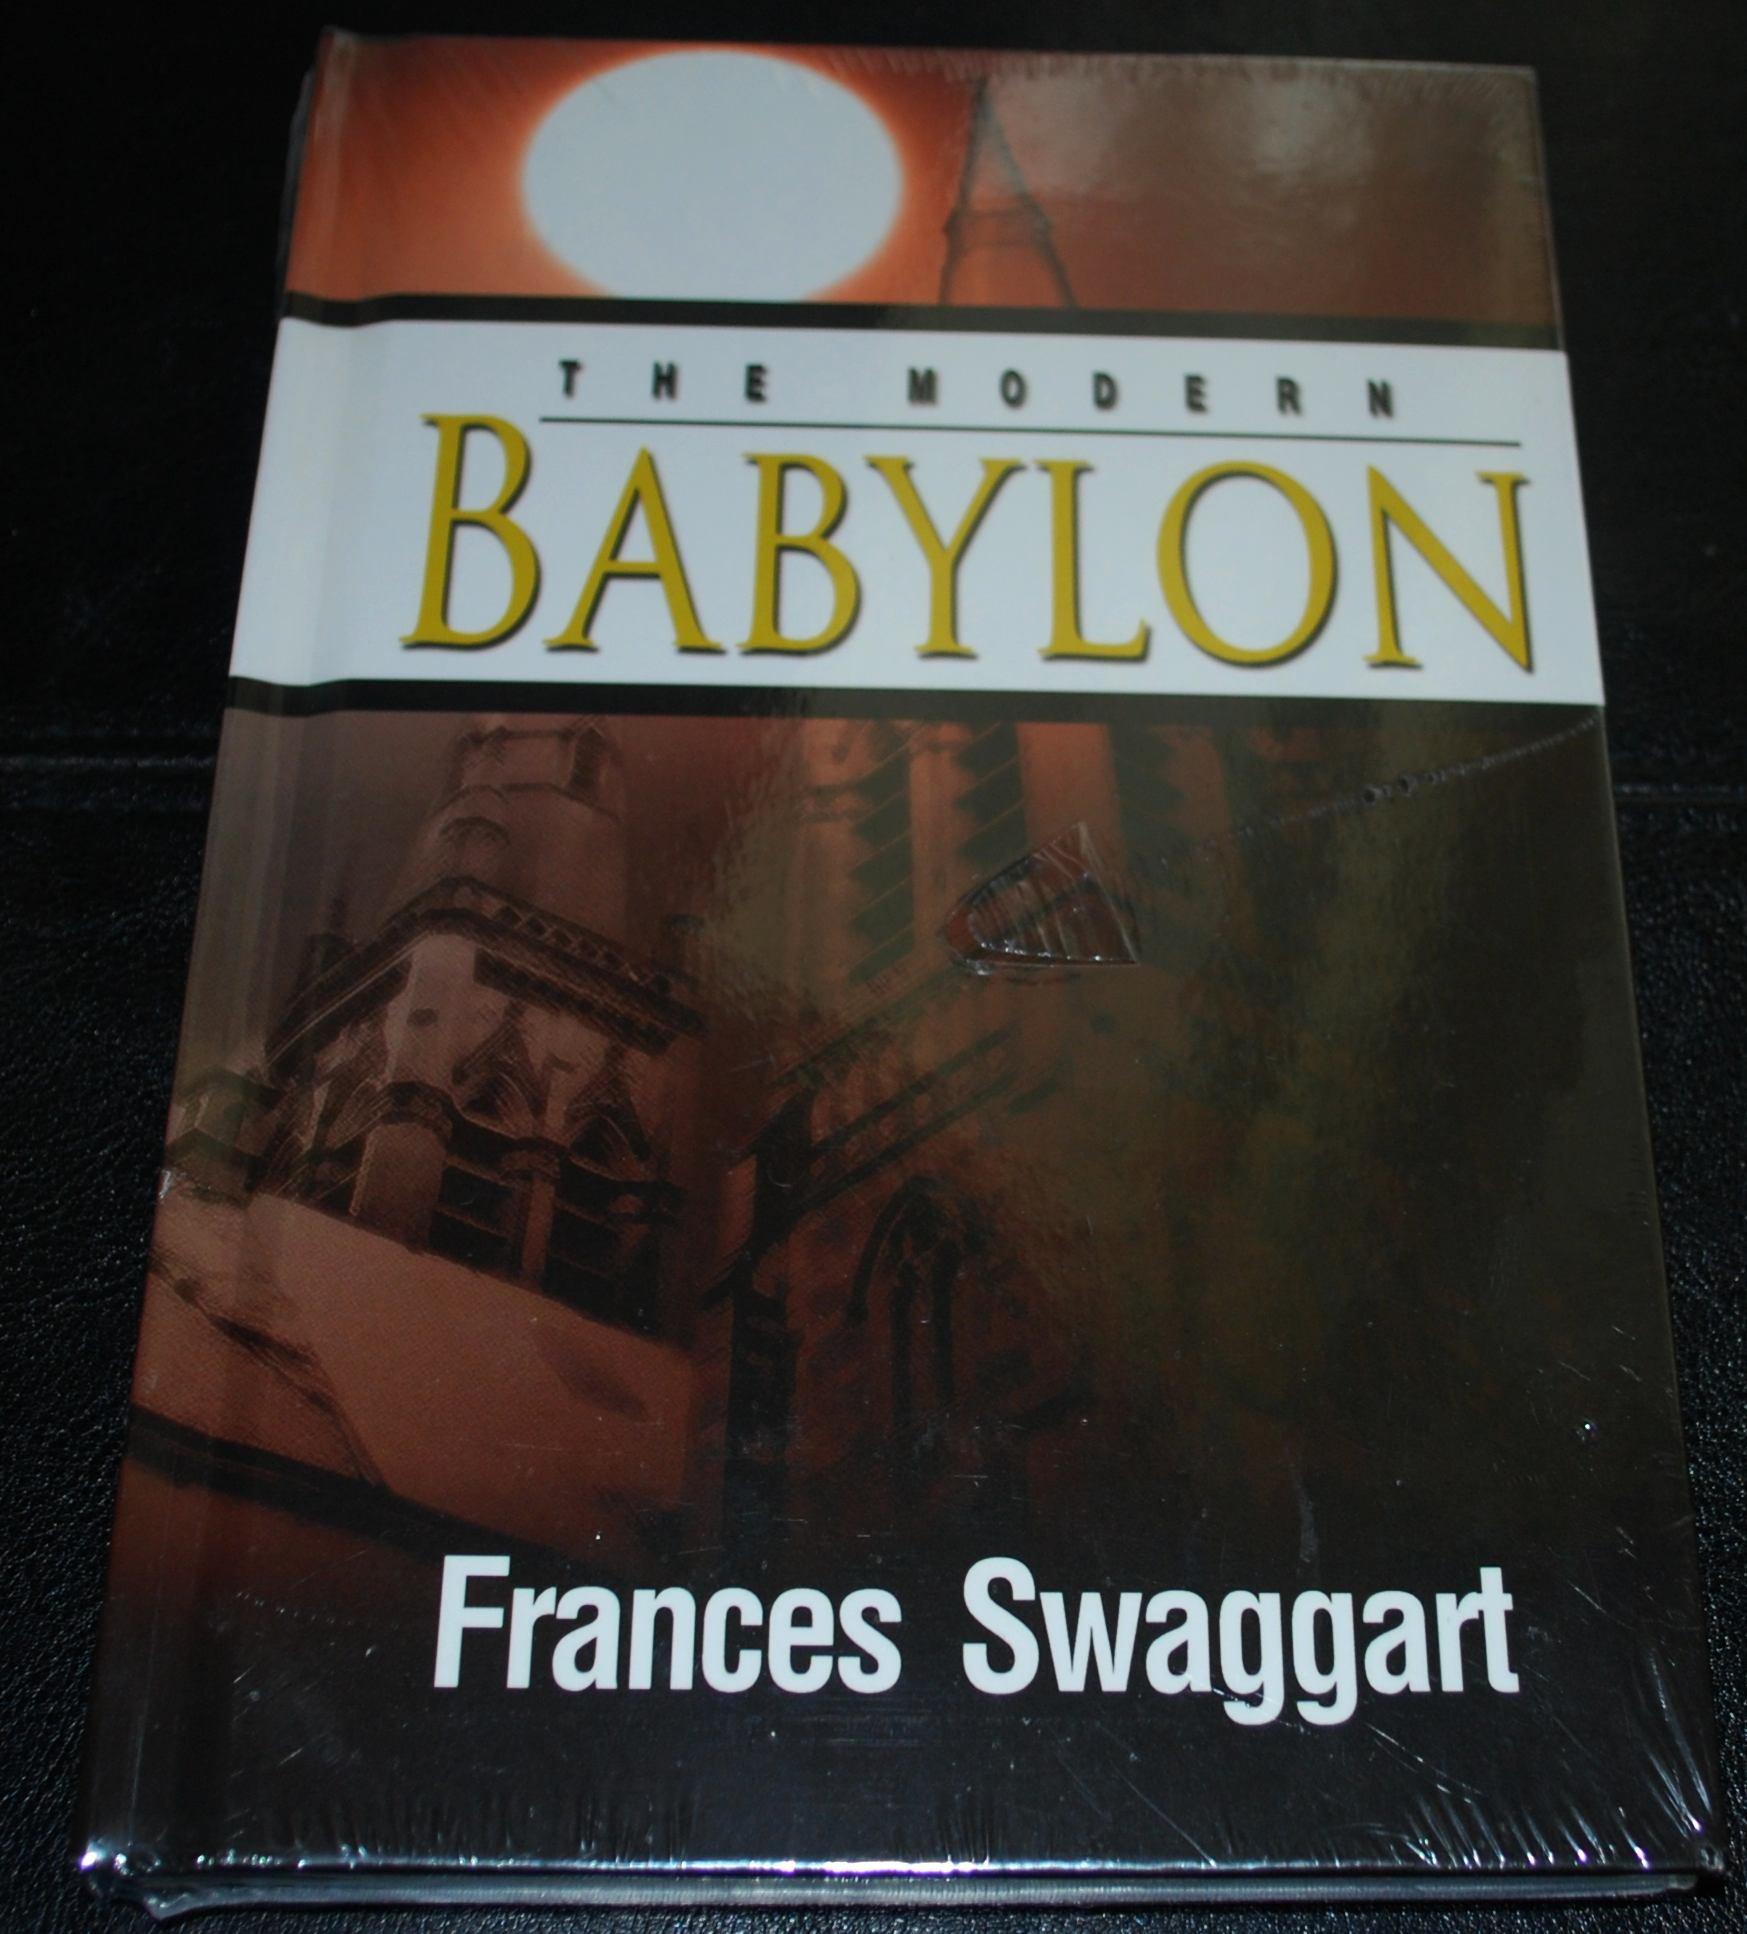 The Modern Babylon: Frances Swaggart: 9781934655801: Amazon com: Books